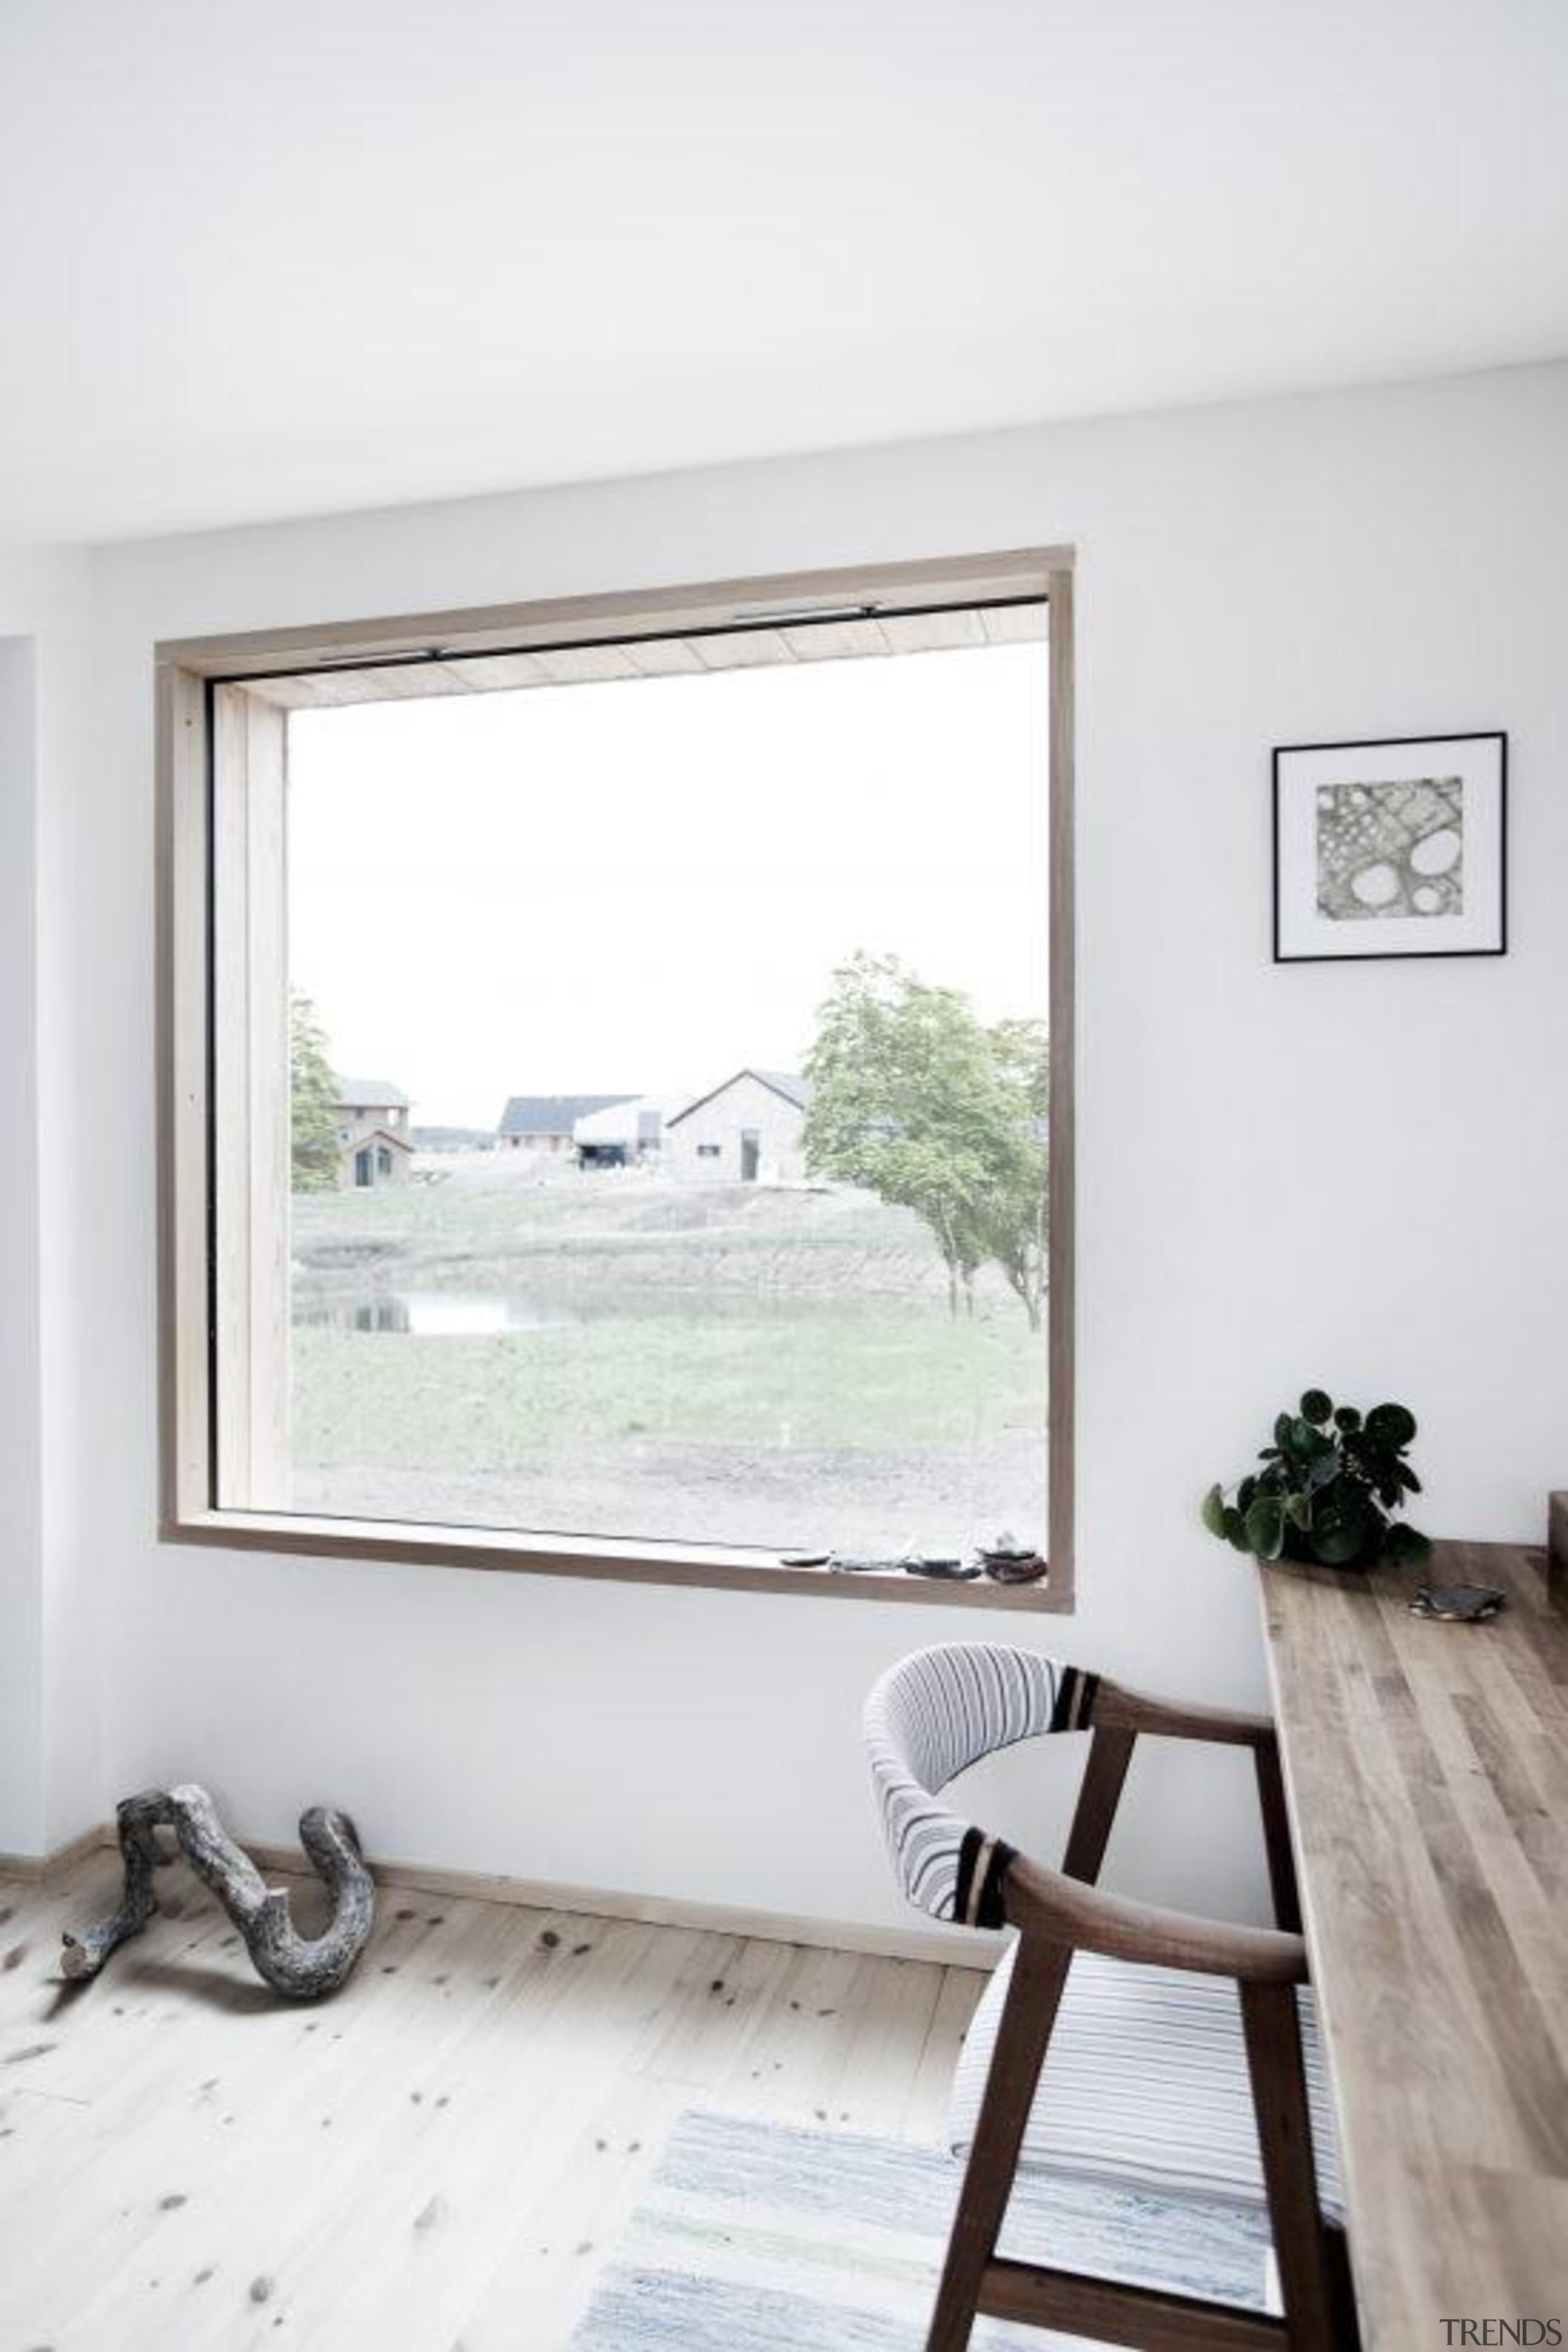 Architect: Sigured Larsen floor, home, house, interior design, window, white